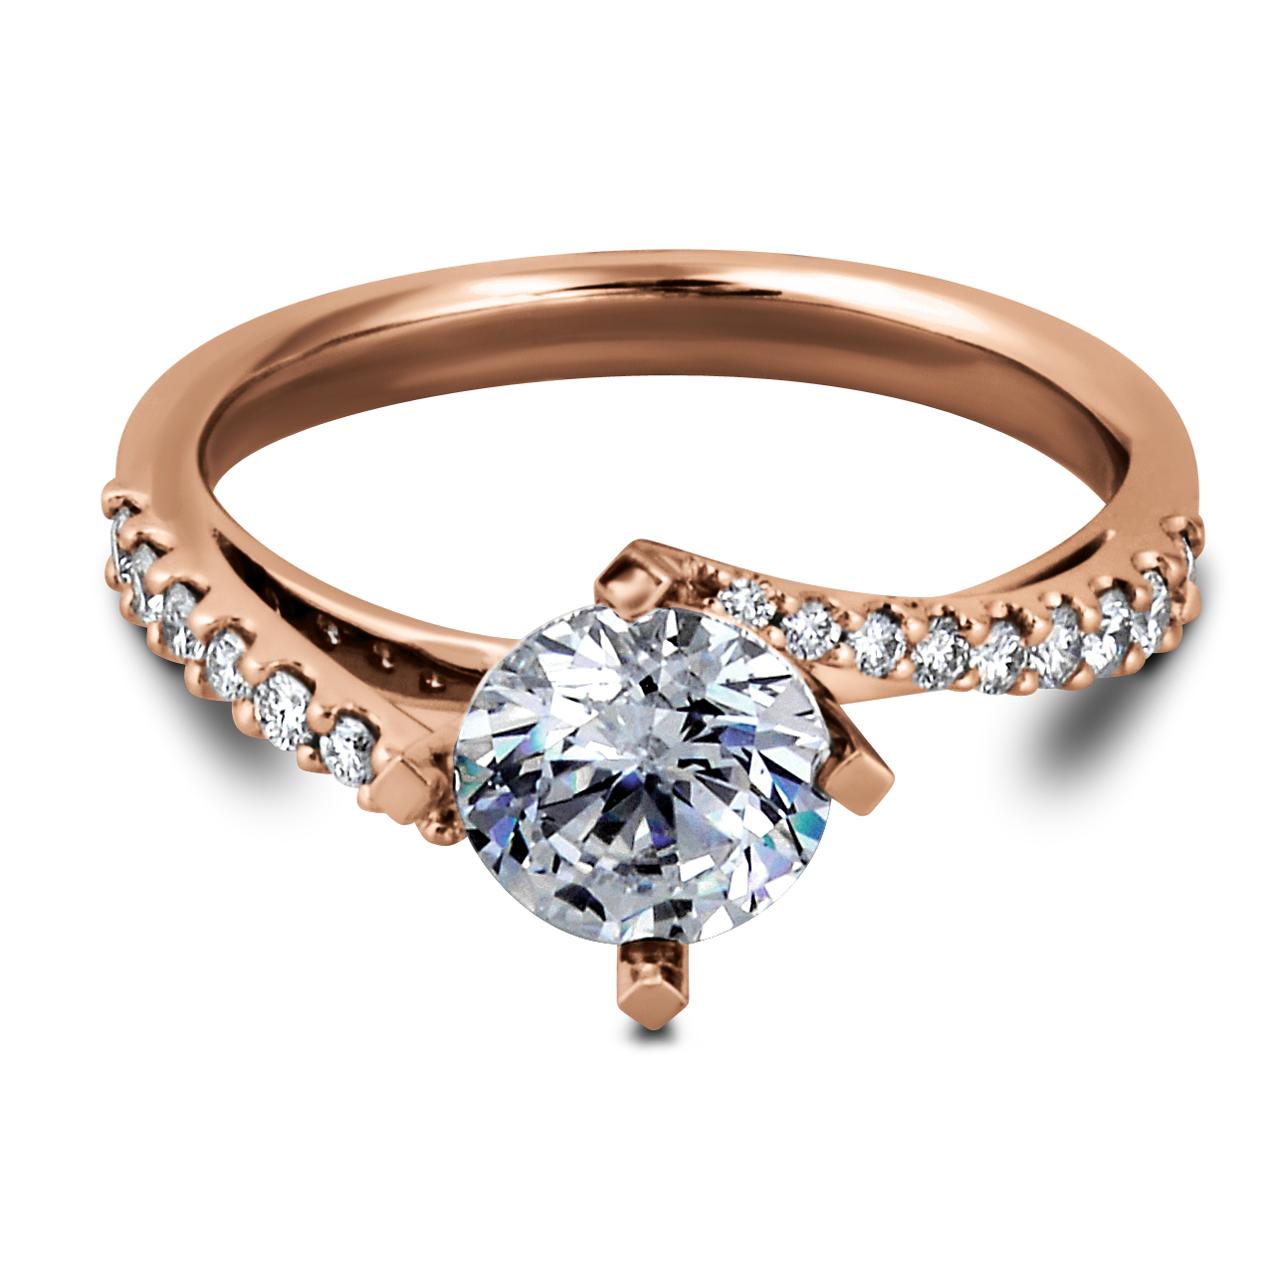 4 Prong Carponia Diamond Ring